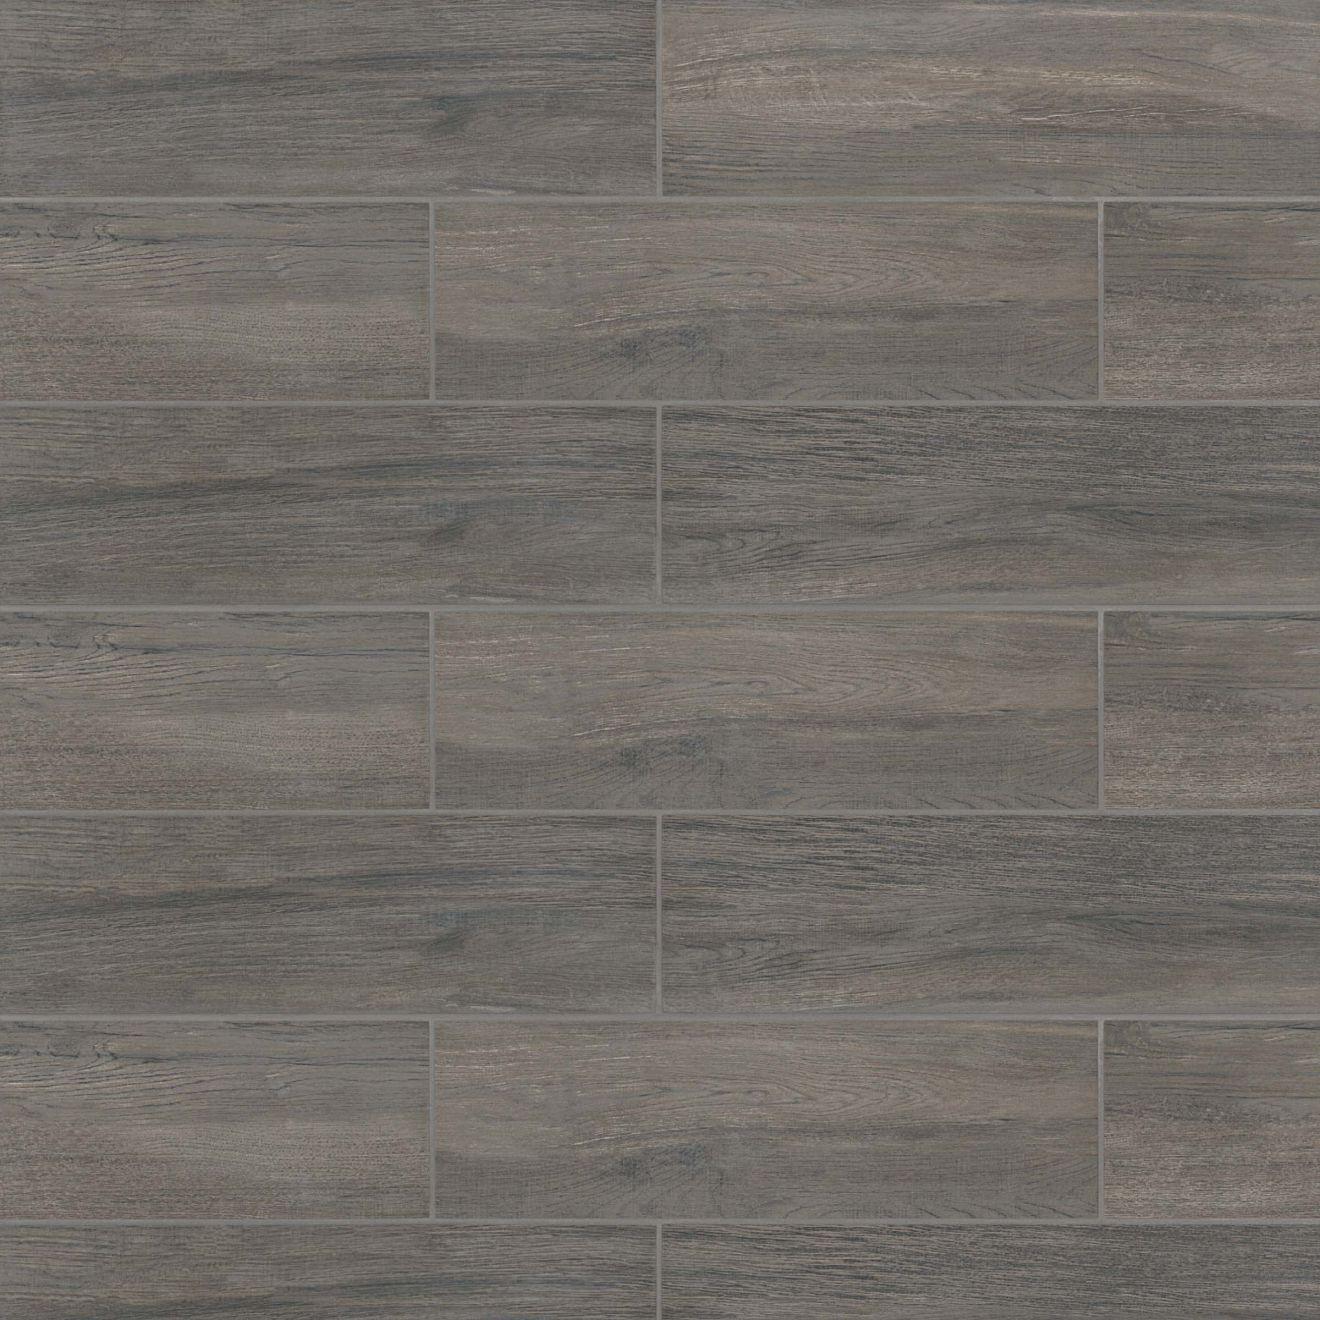 "Balboa 7"" x 24"" Floor & Wall Tile in Brown"